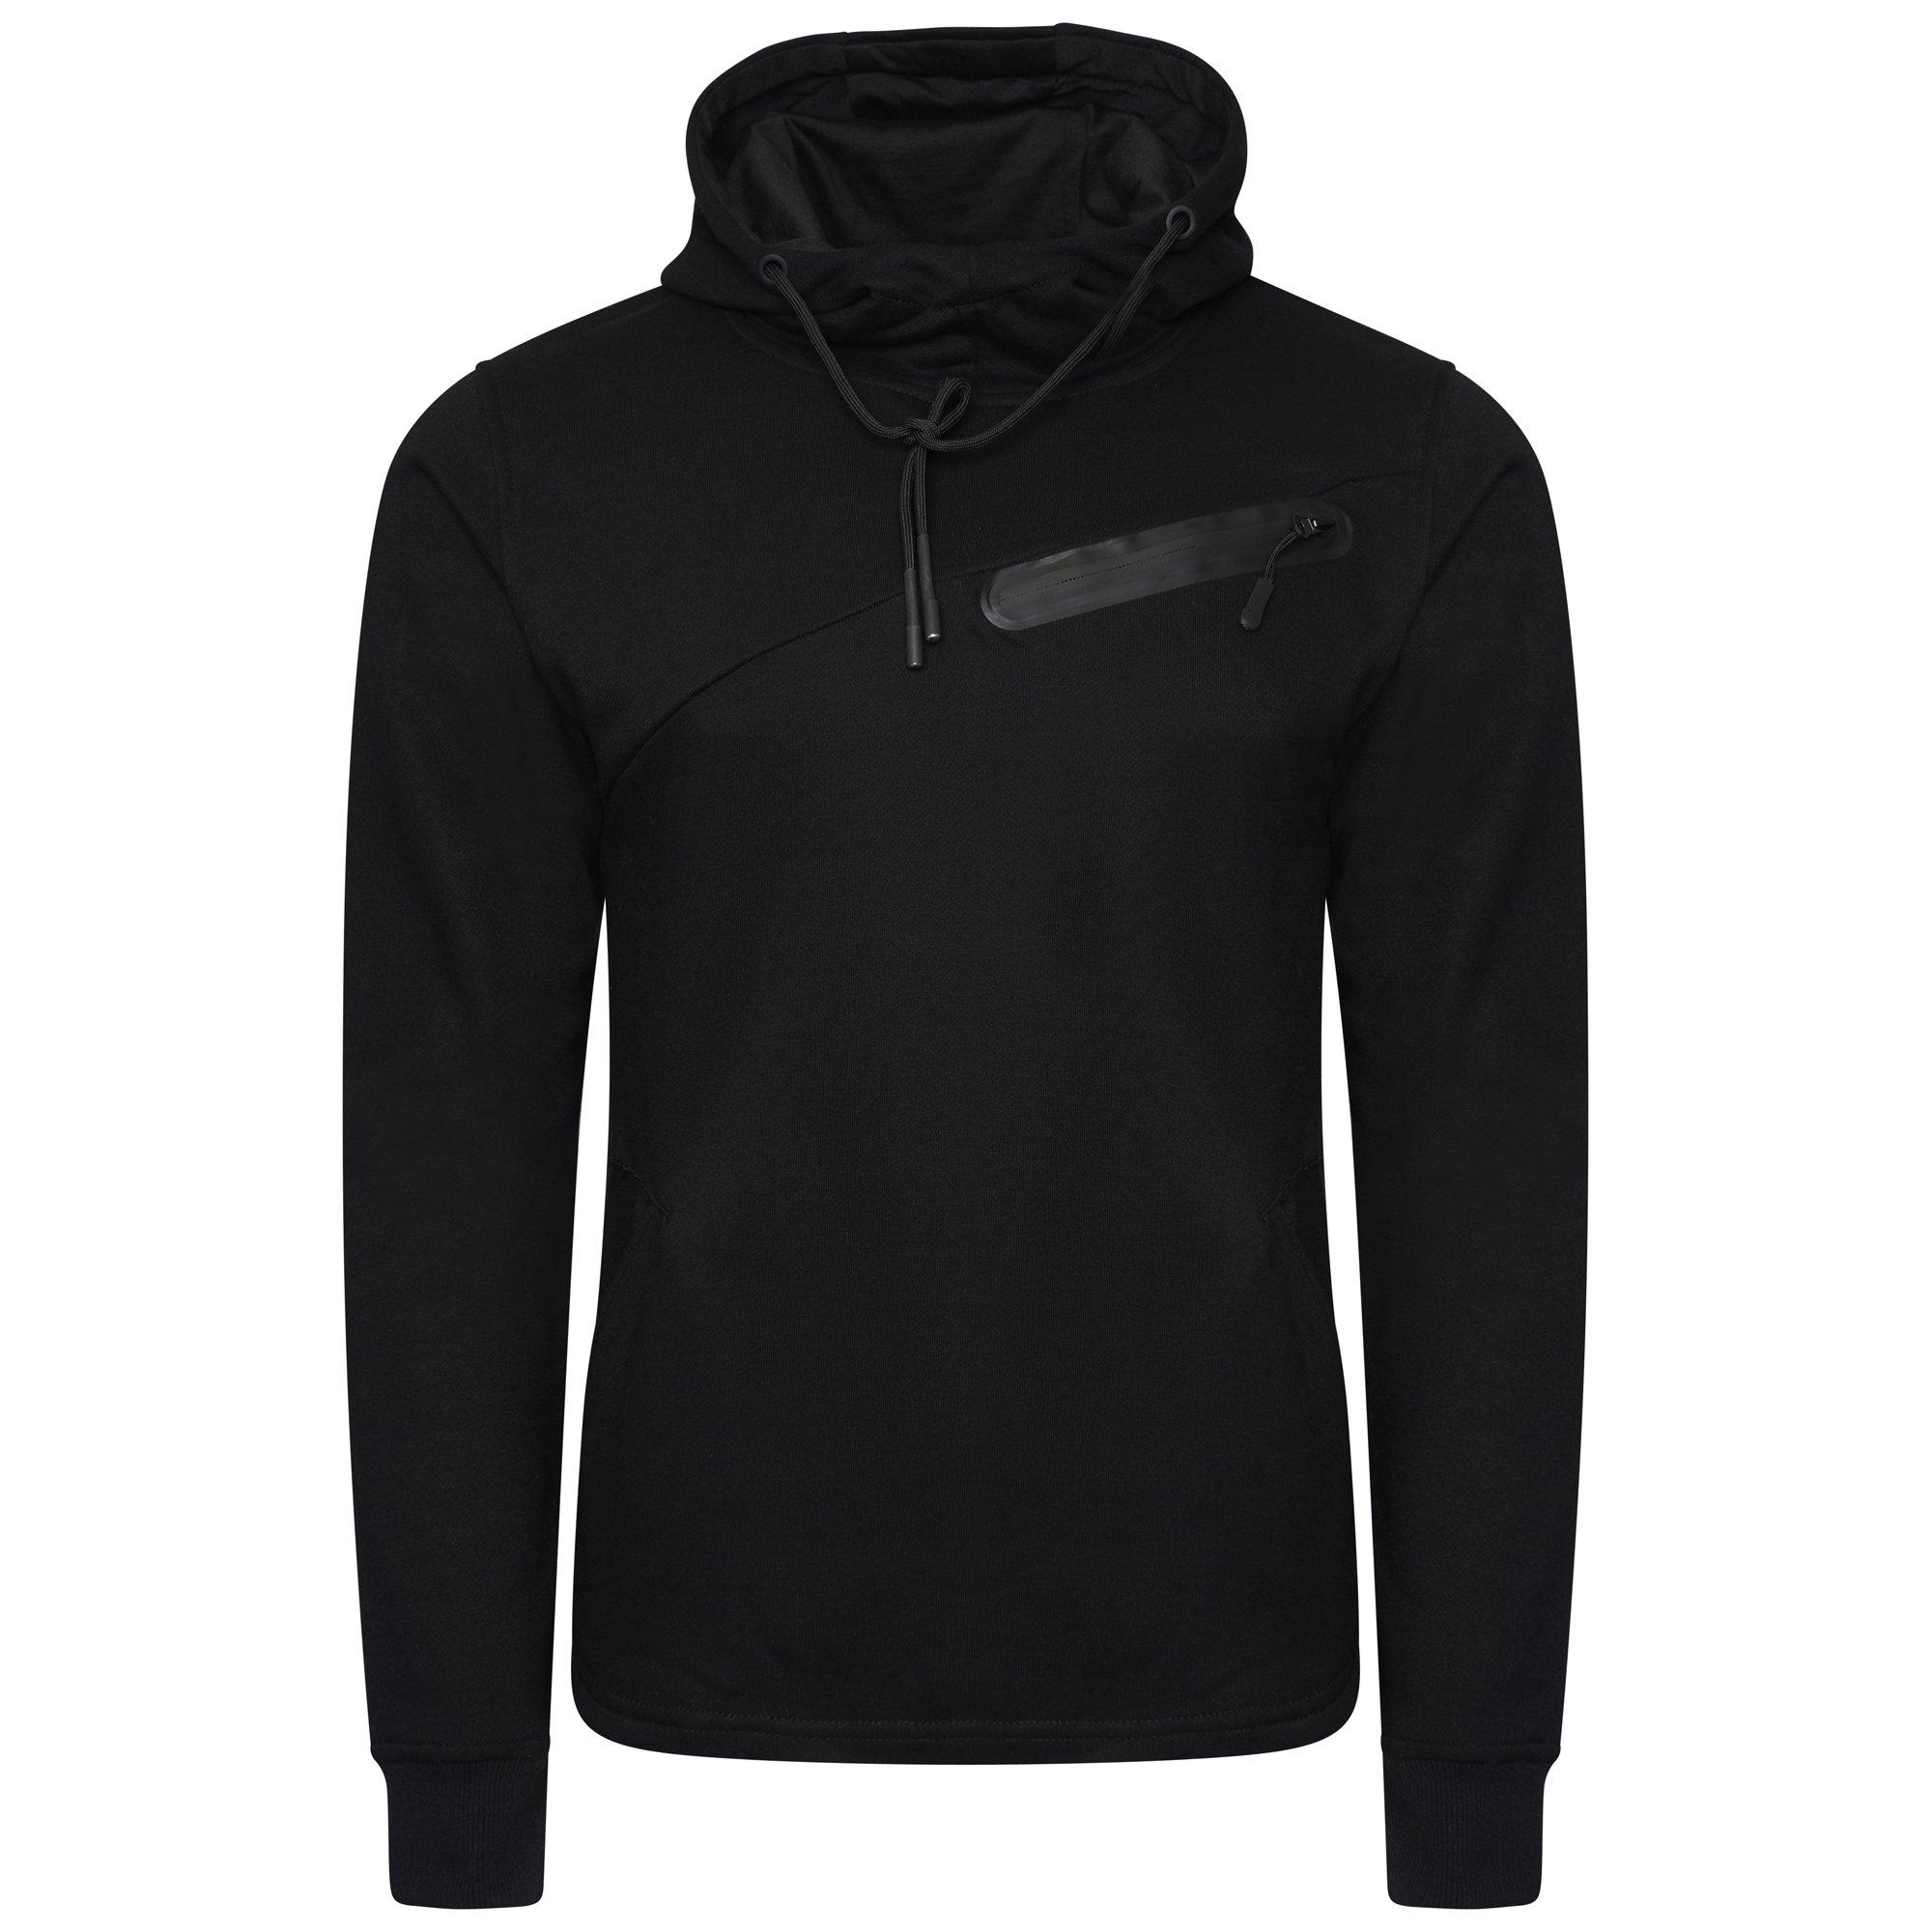 Wholesale Joblot Mens Plain Black Pullover Hoody 40 Items Per Box